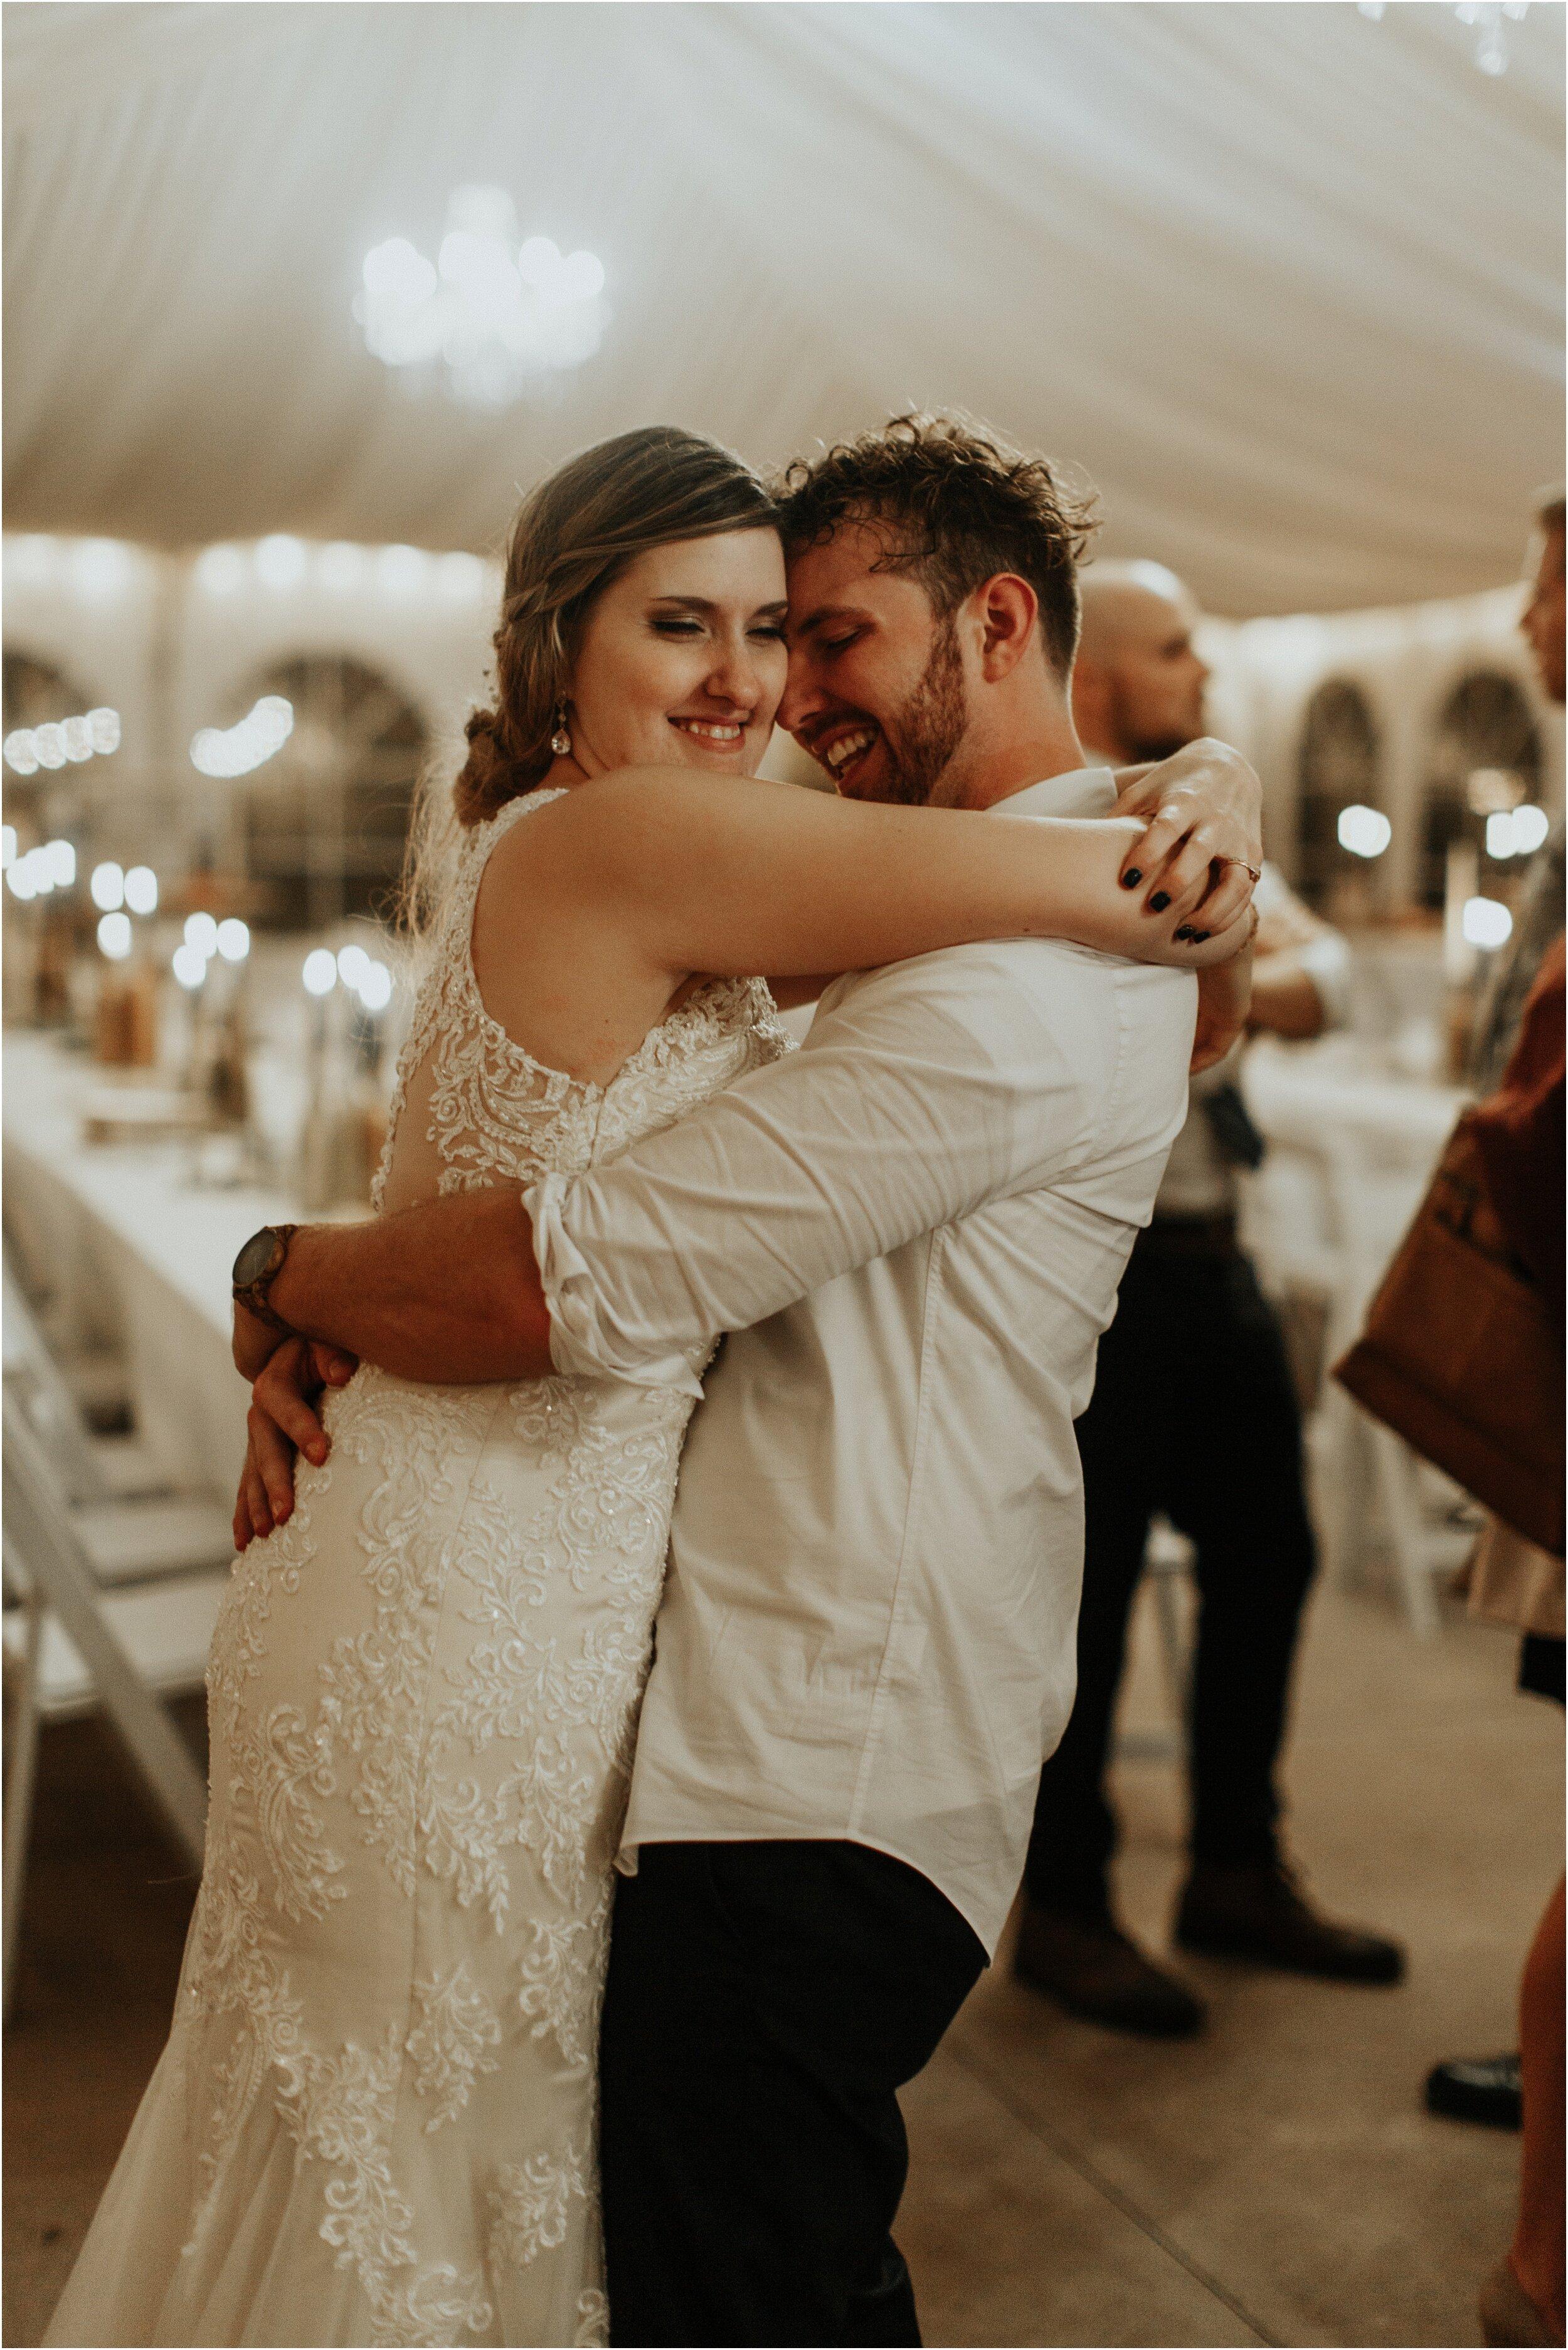 steph-and-jordan-cox-our-wedding-historic-shady-lane-compass-wedding-collective-hazel-lining-photography-destination-elopement-wedding-engagement-photography_0093.jpg